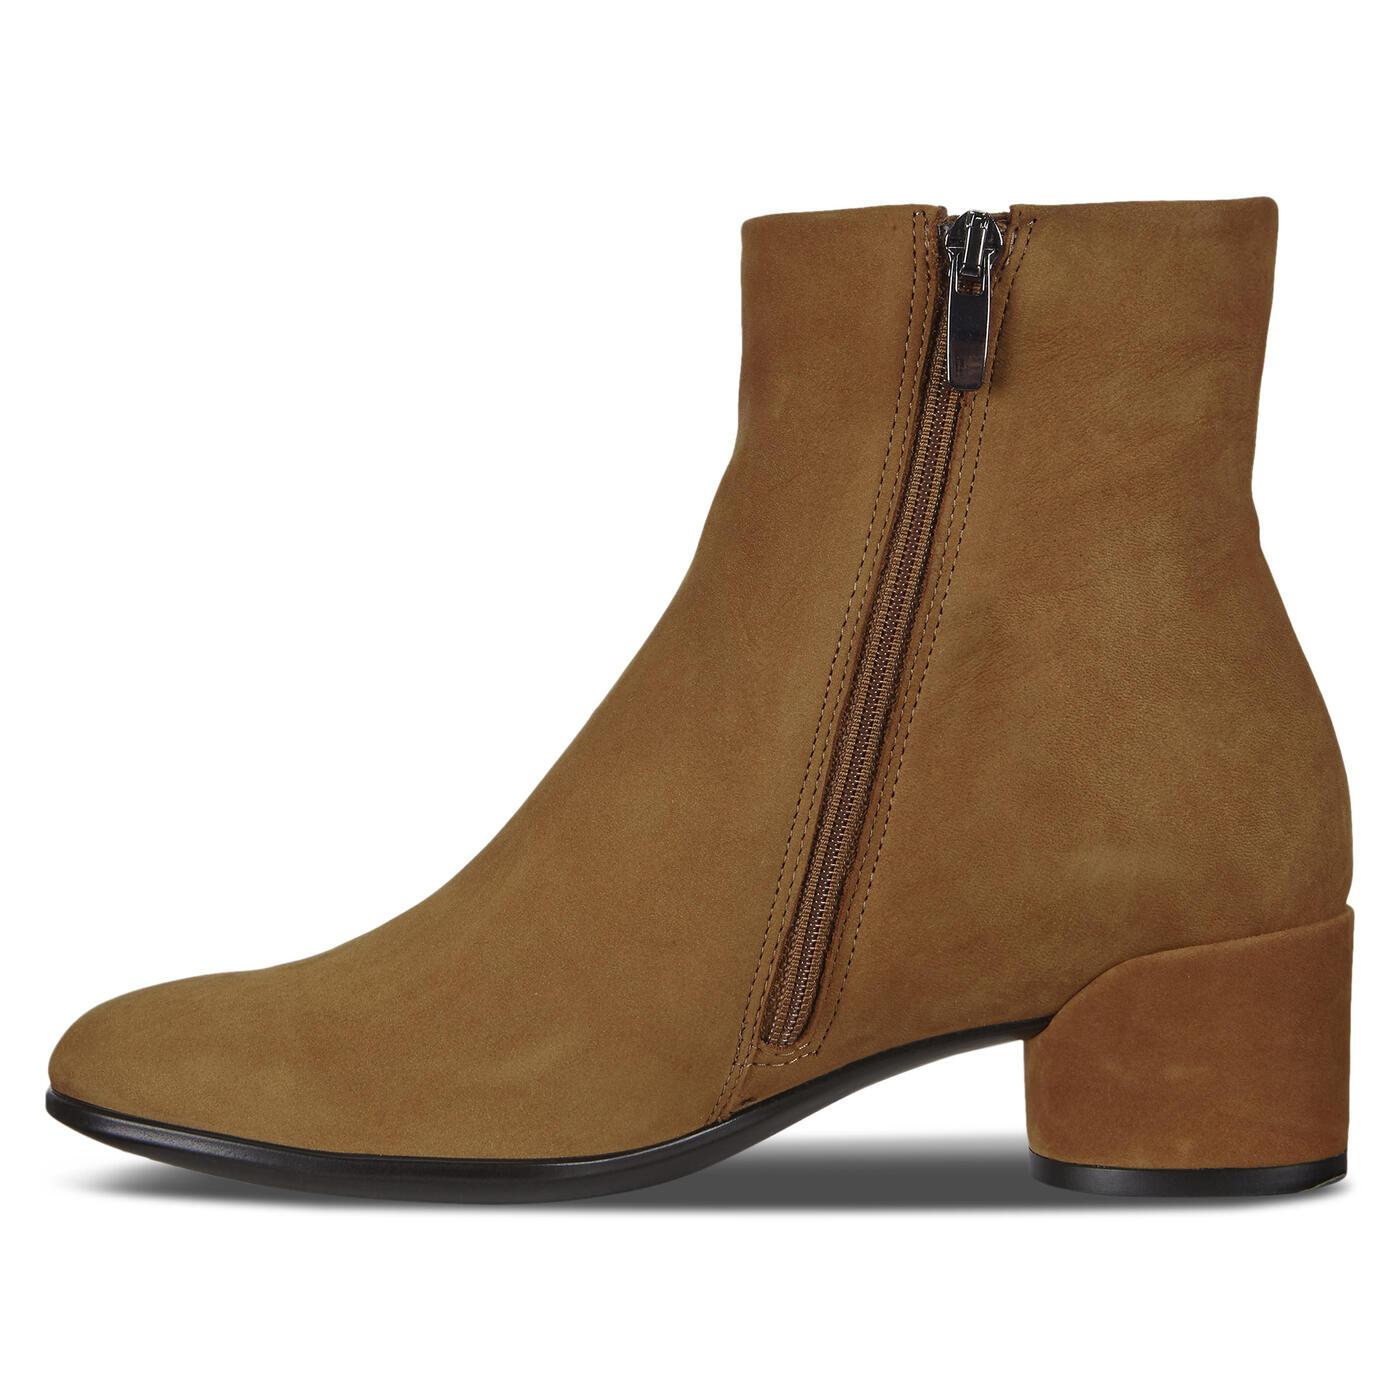 ECCO SHAPE 35 MOD BLOCK Women's Boot